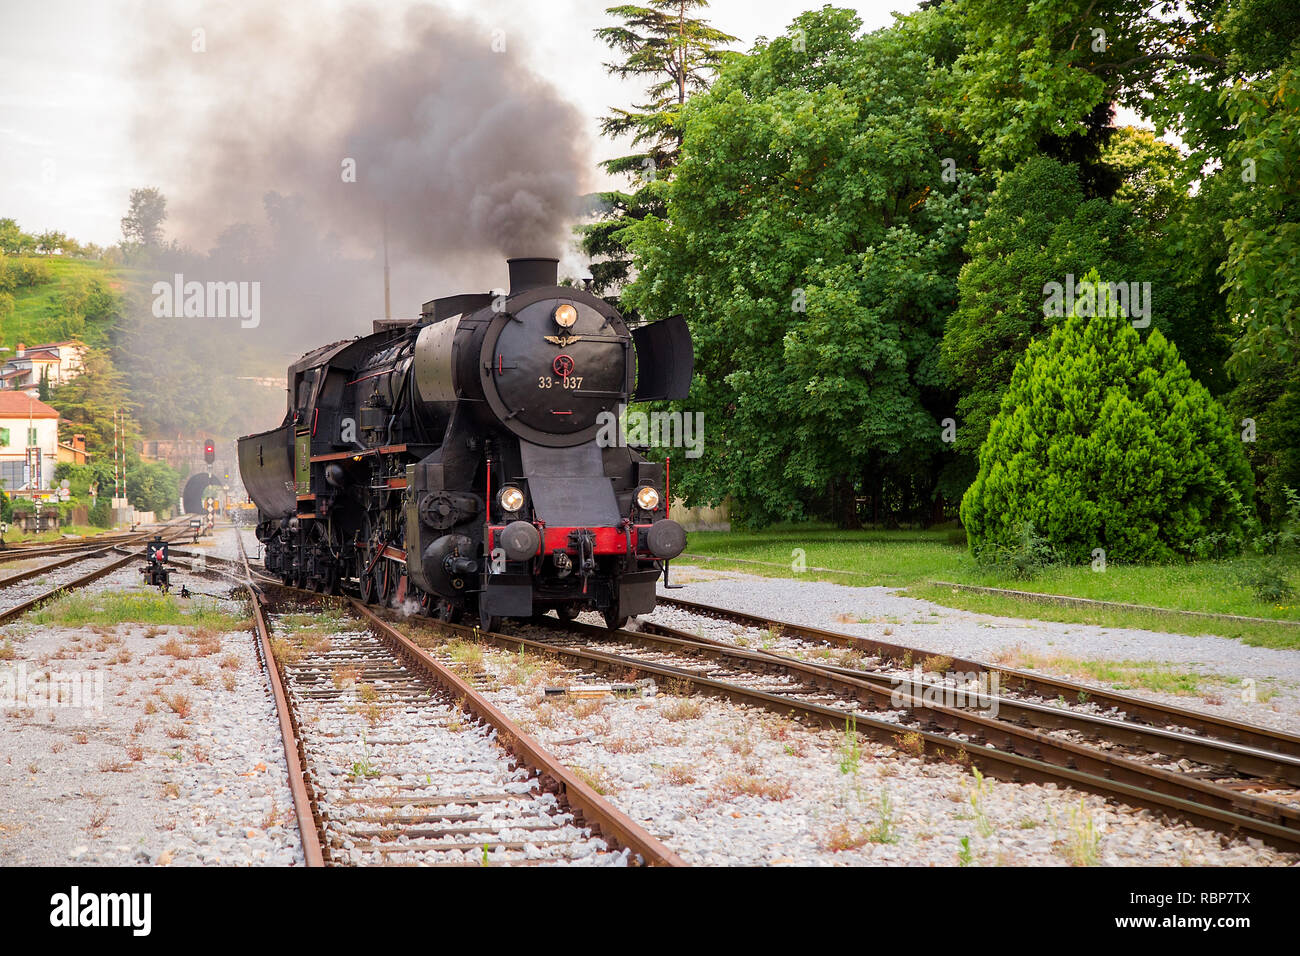 Old Steam train at the Railway Station of Nova Gorica, Slovenia - Stock Image